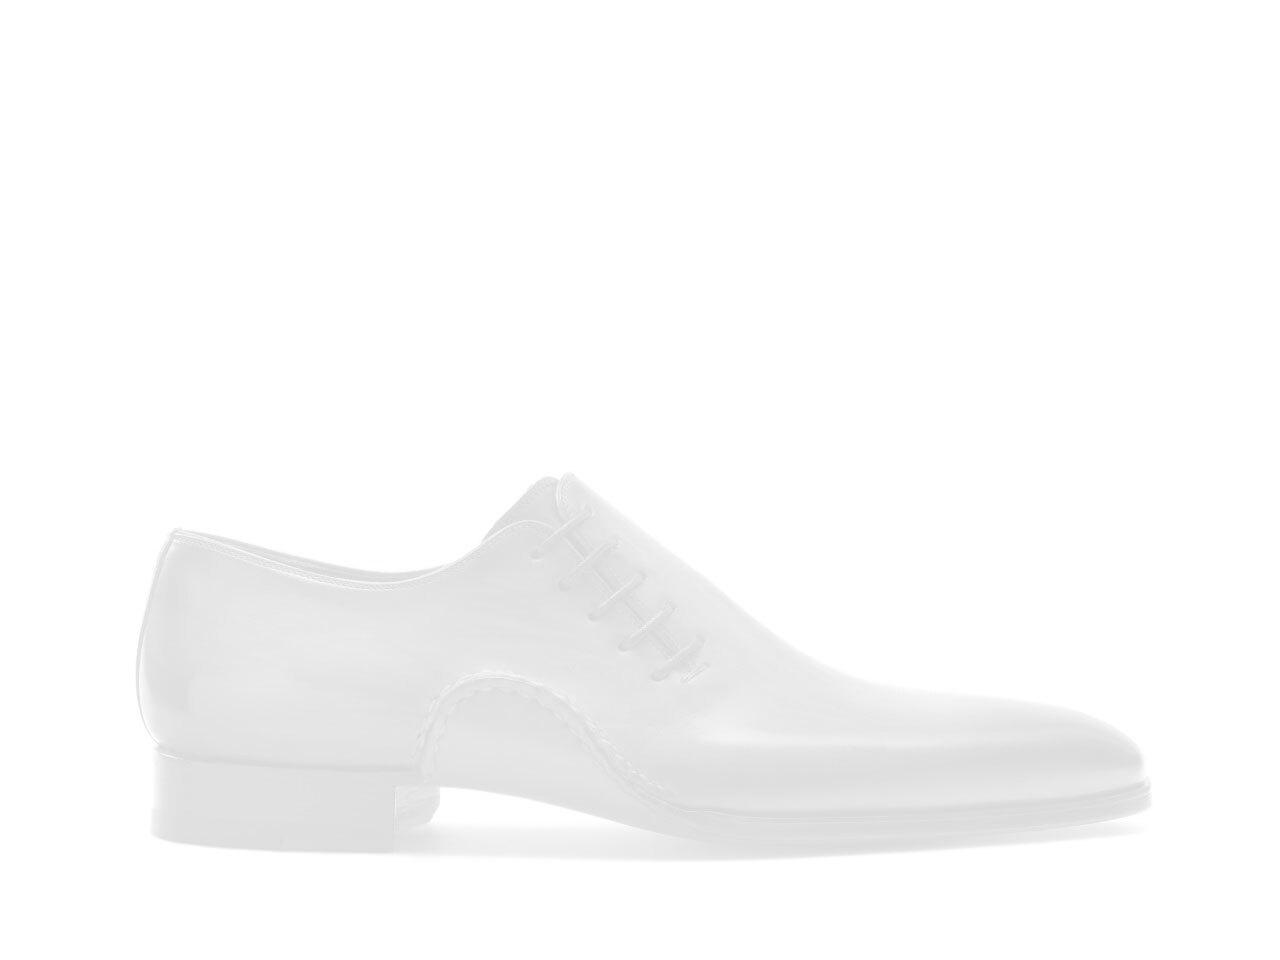 Side view of the Magnanni Franklin Cognac Men's Oxford Shoes